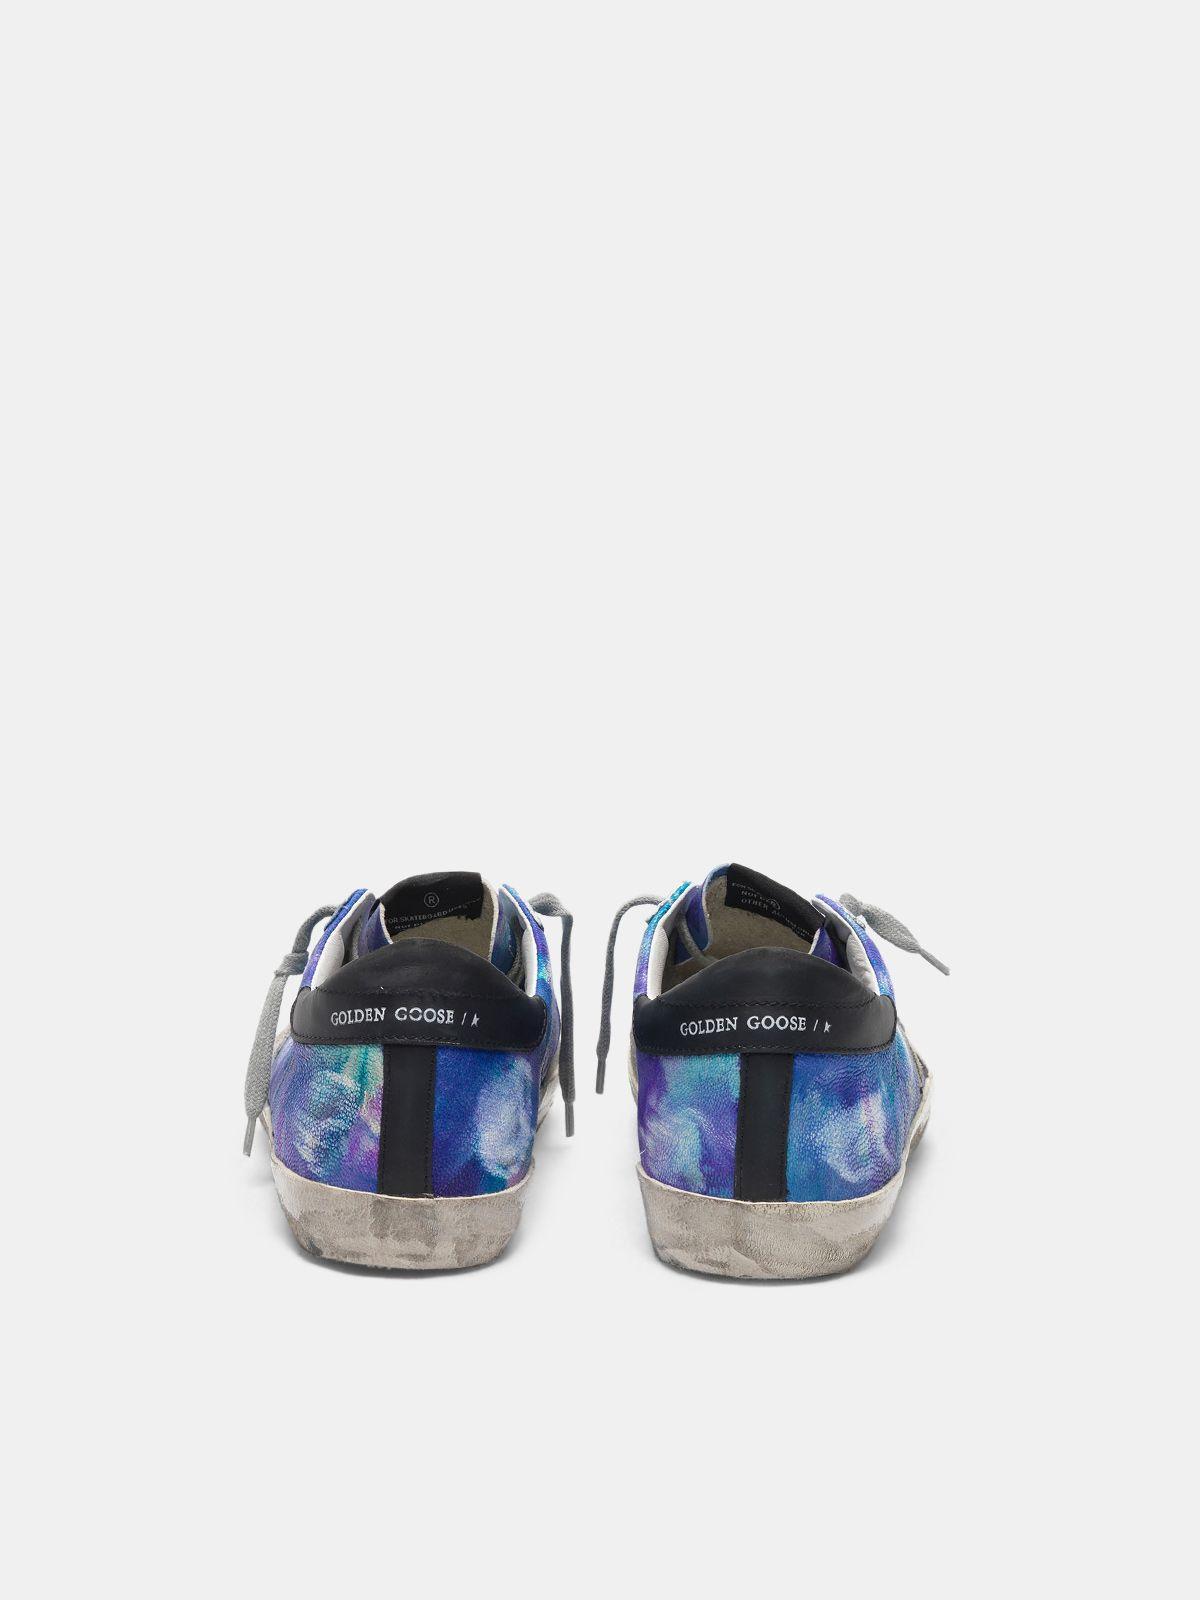 Golden Goose - Super-Star sneakers in tie-dye leather   in